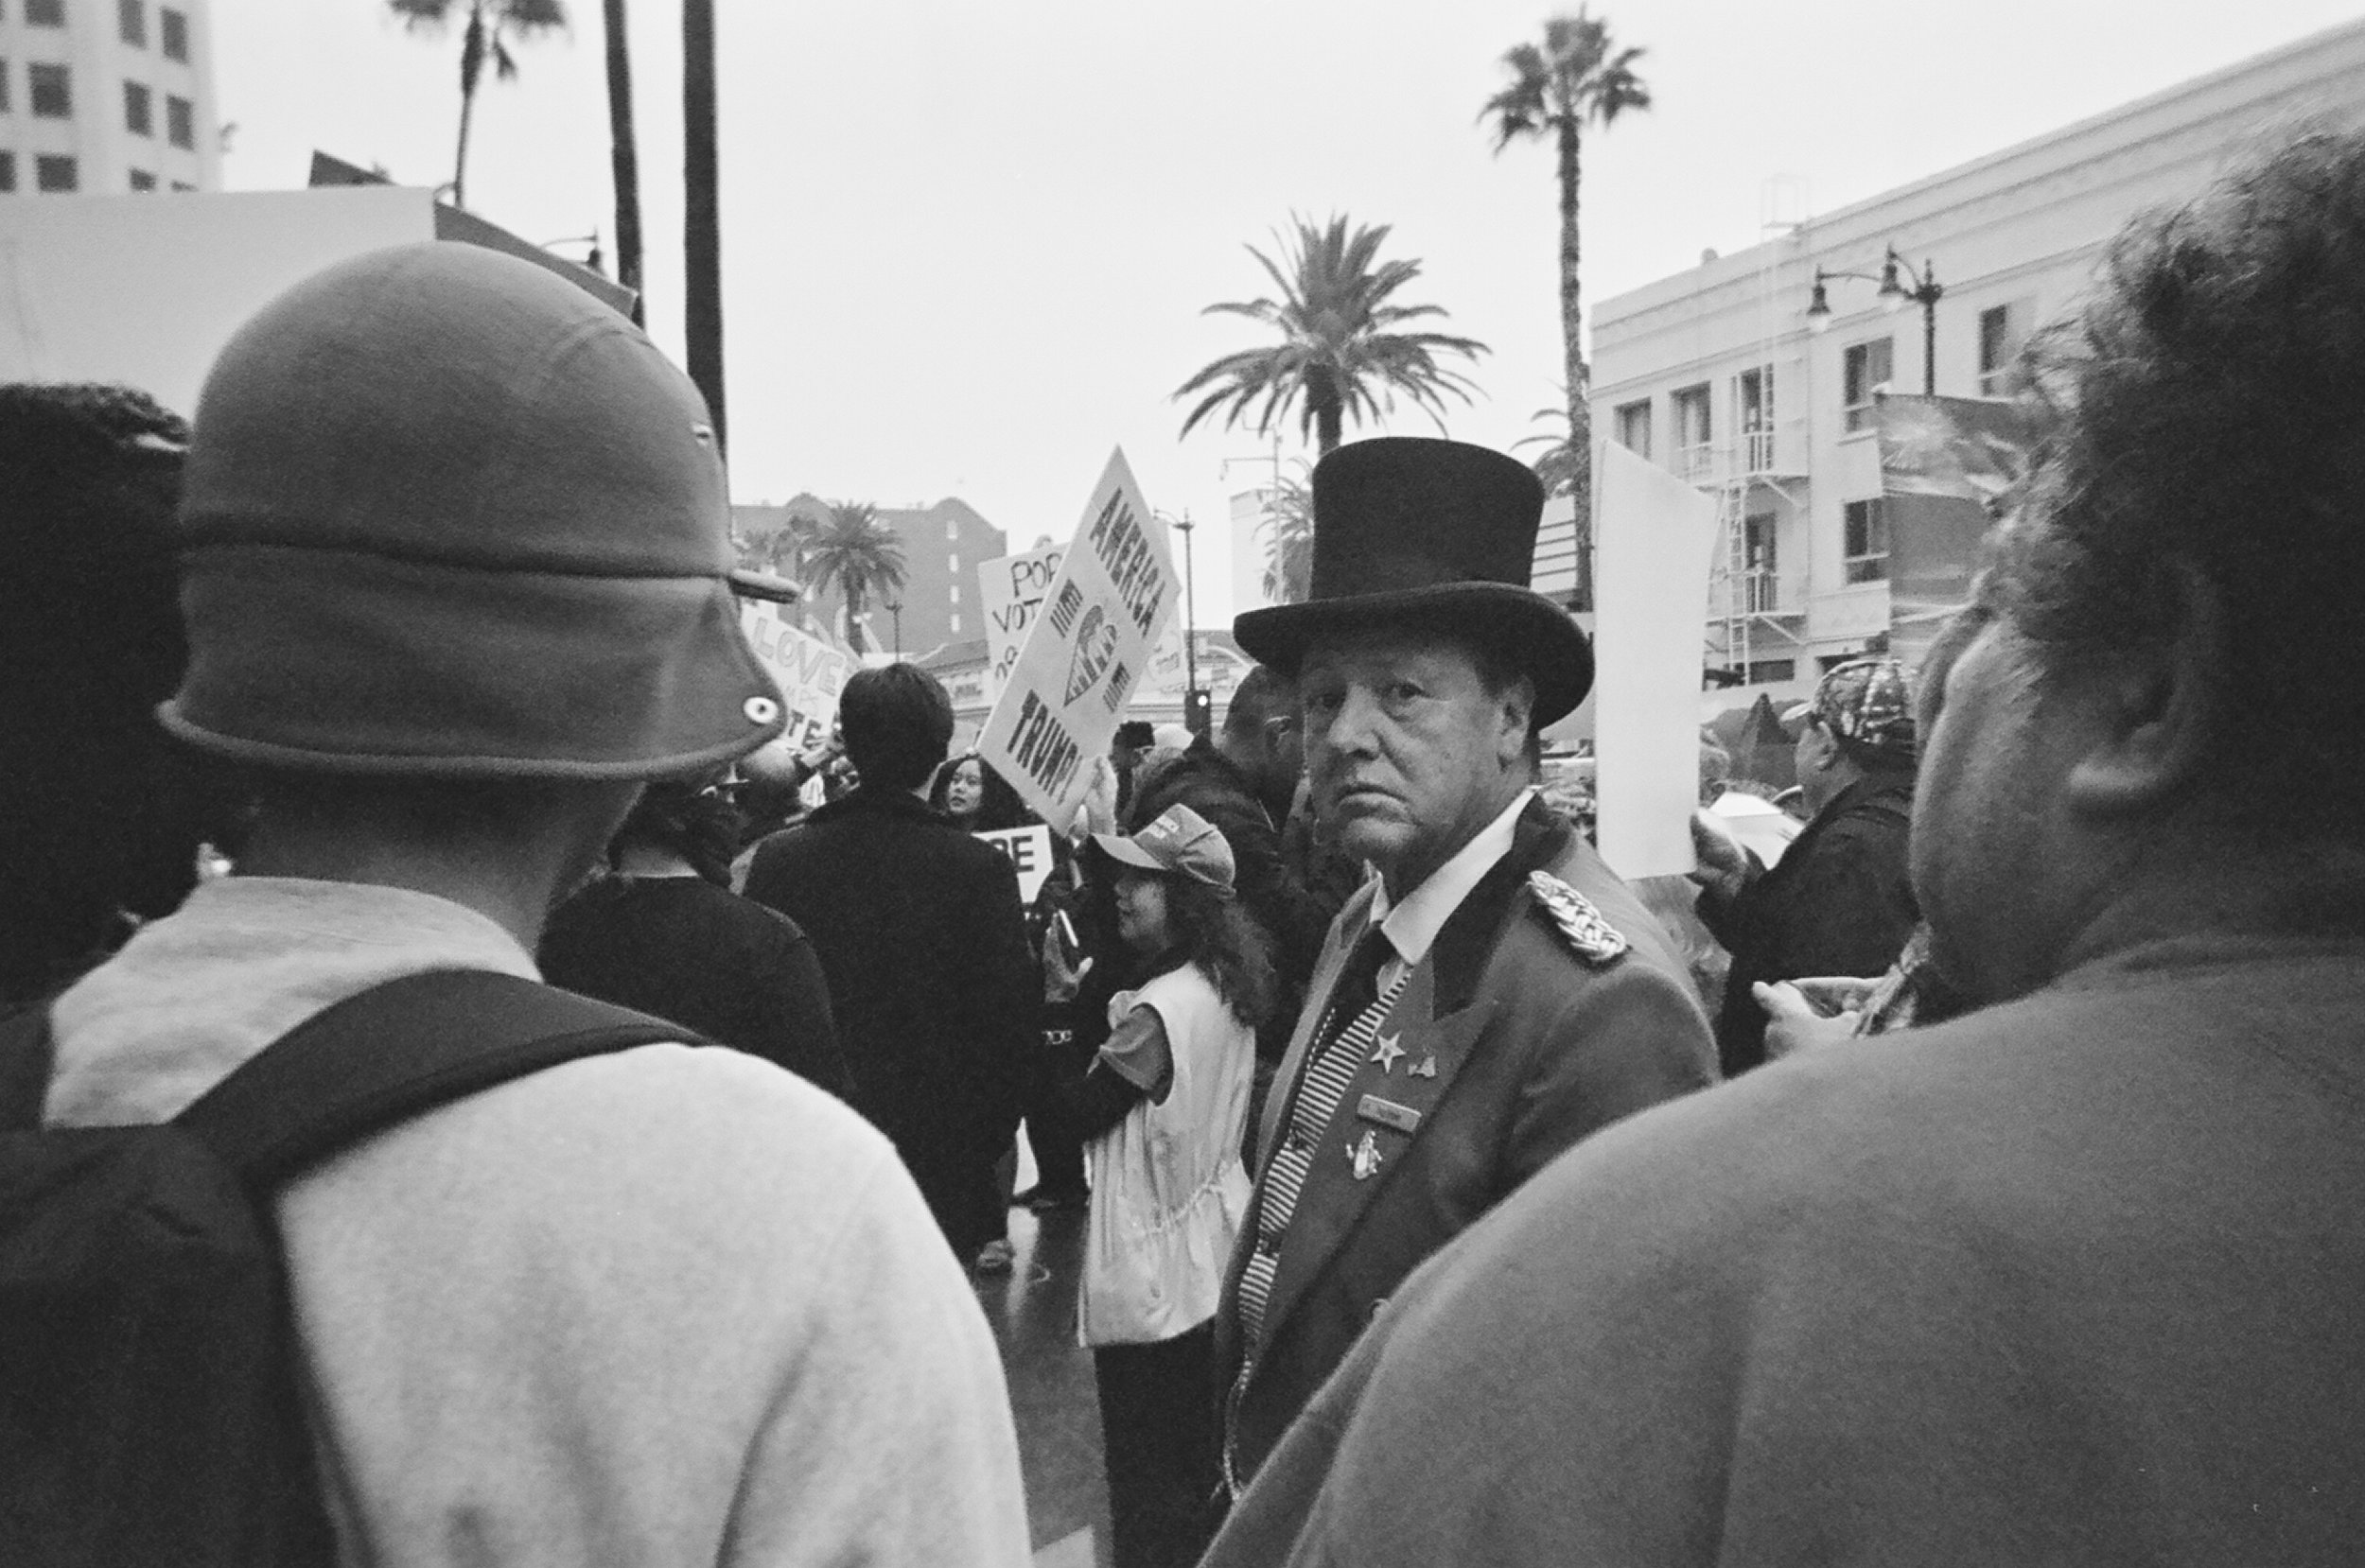 Los Angeles em 35mm, 2016.